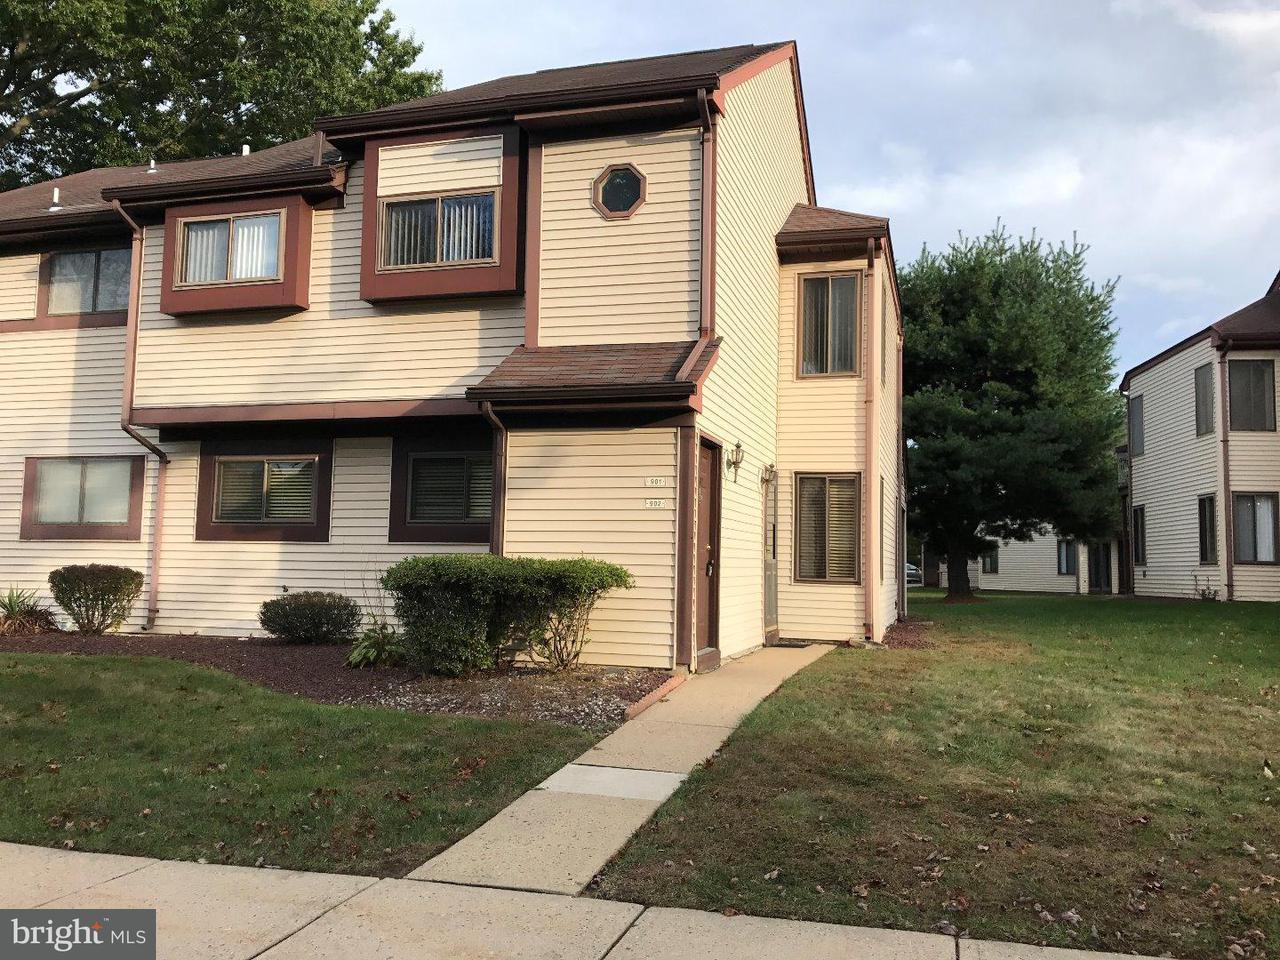 Casa unifamiliar adosada (Townhouse) por un Alquiler en 902 JACOB CT #4 Dayton, Nueva Jersey 08810 Estados UnidosEn/Alrededor: South Brunswick Township